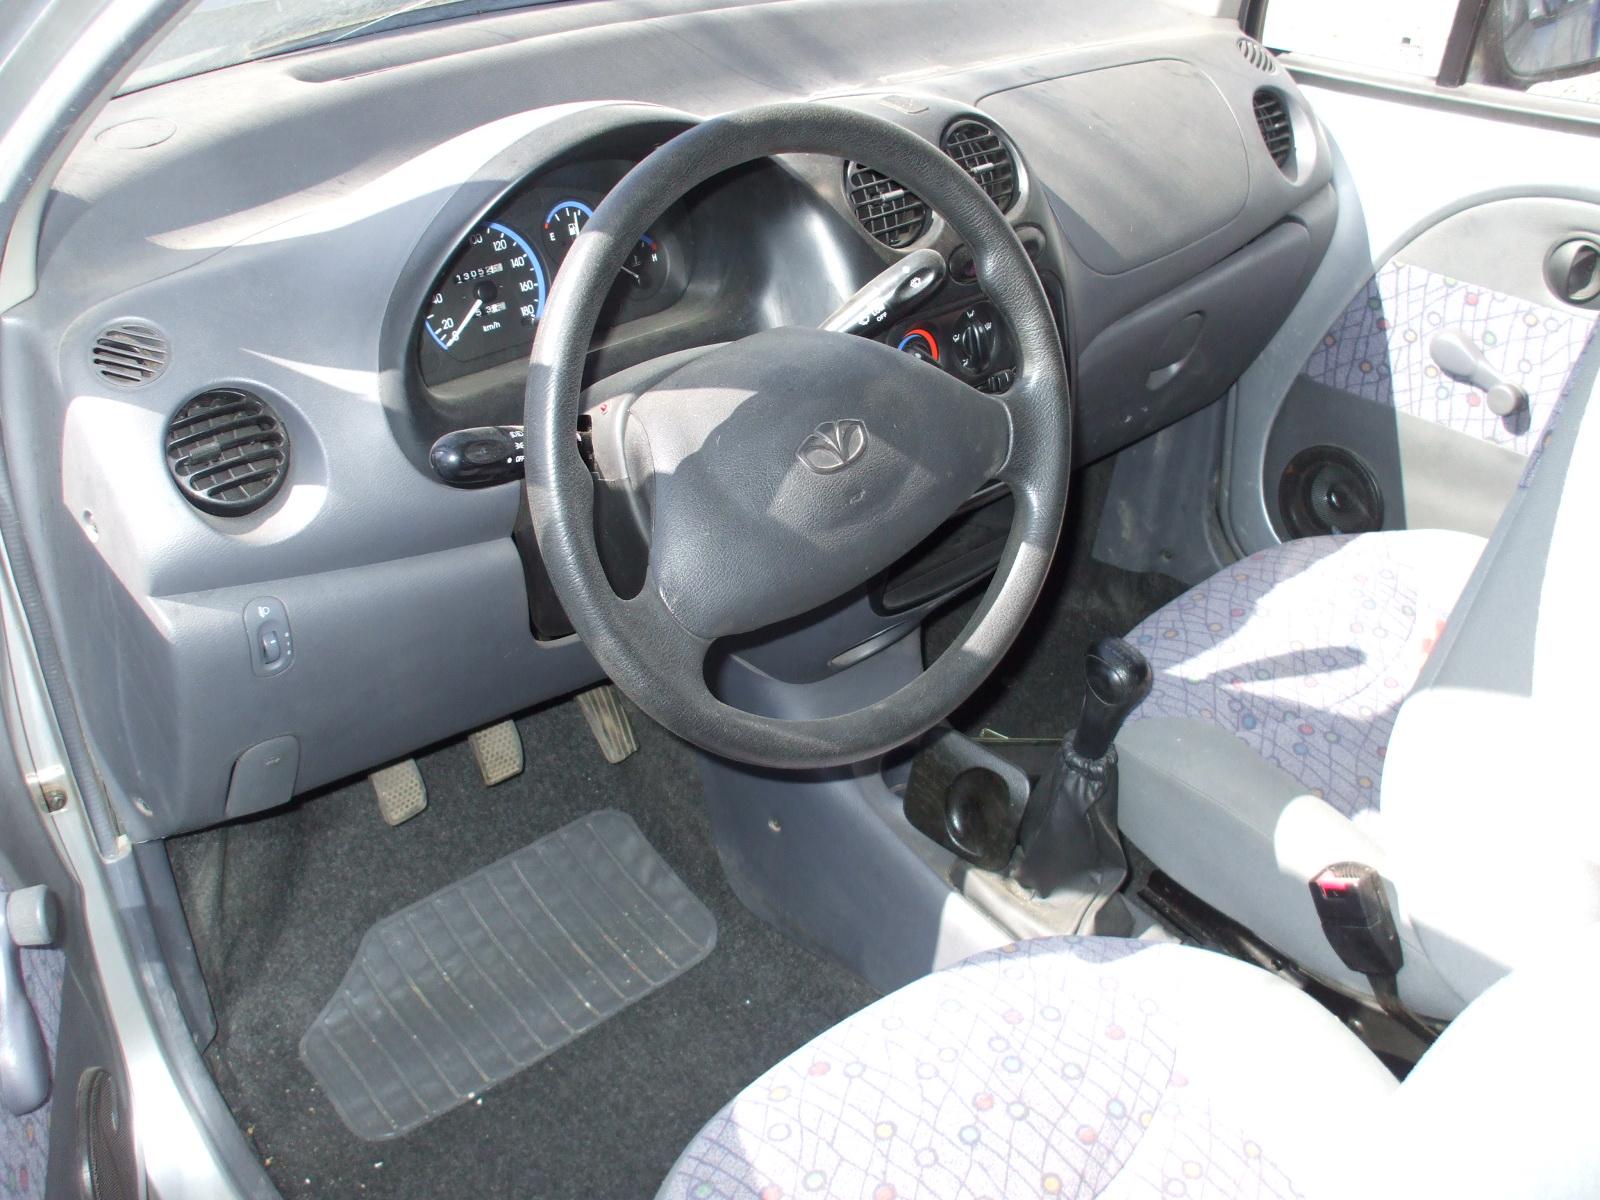 Motor, delcou, alternator, electromotor, cutie Daewoo Matiz - 23 Aprilie 2012 - Poza 1